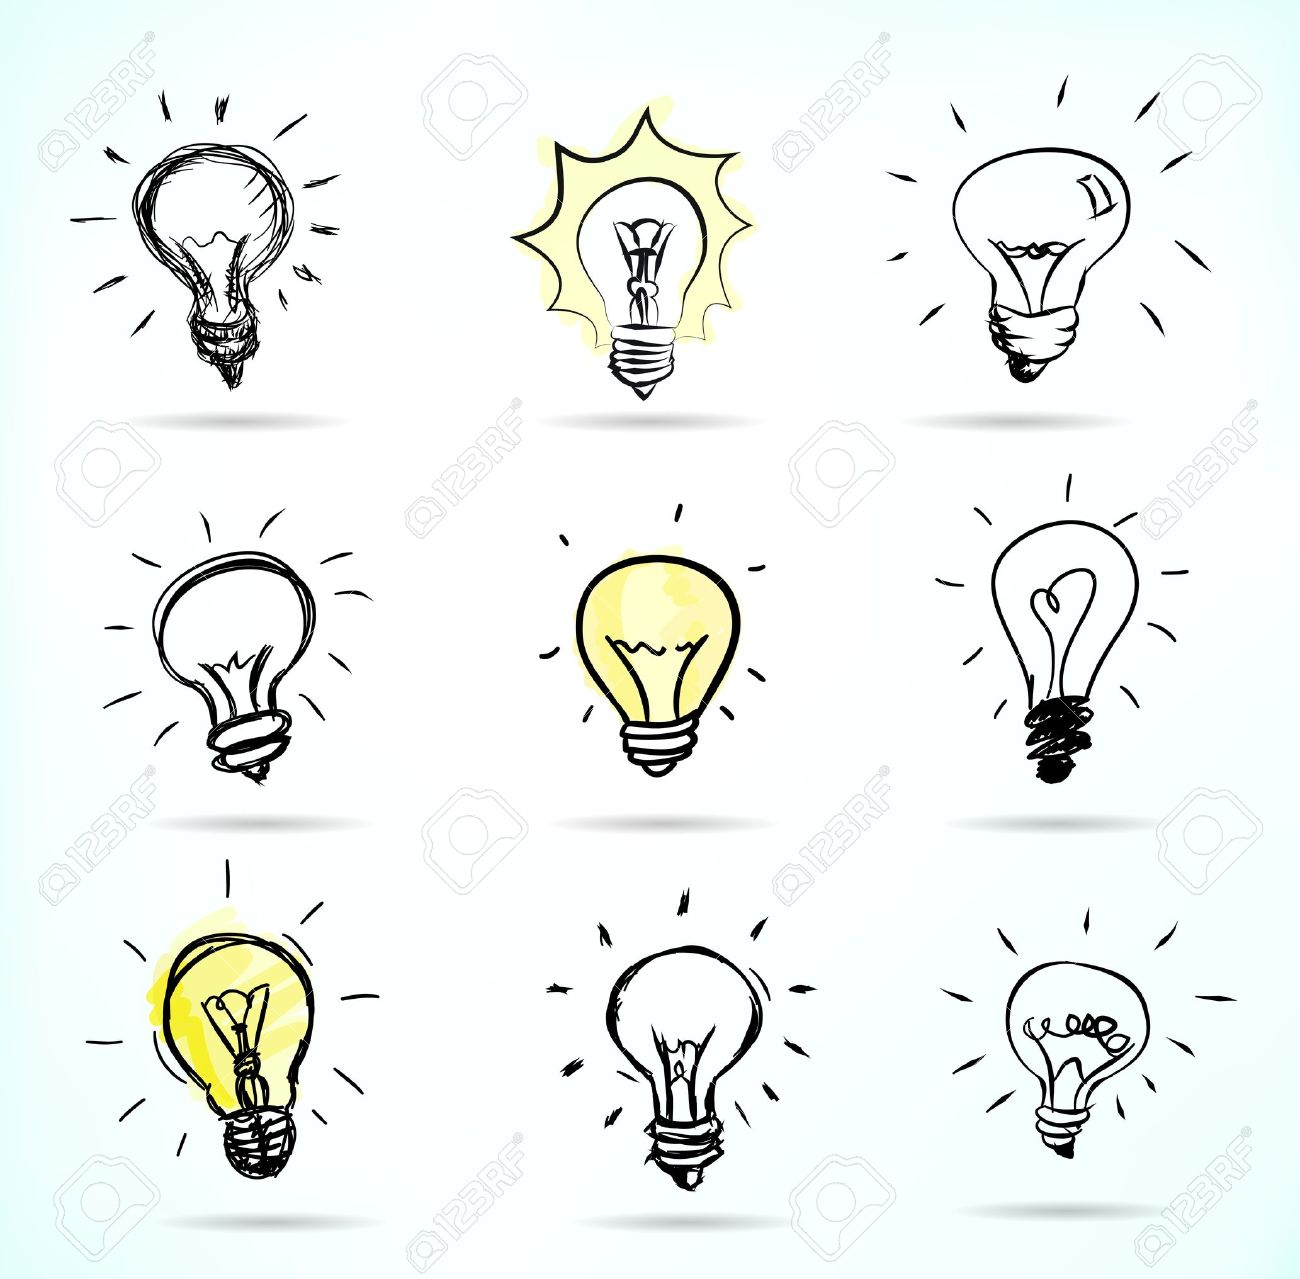 Hand-drawn light bulb illustrations Stock Vector - 12004342